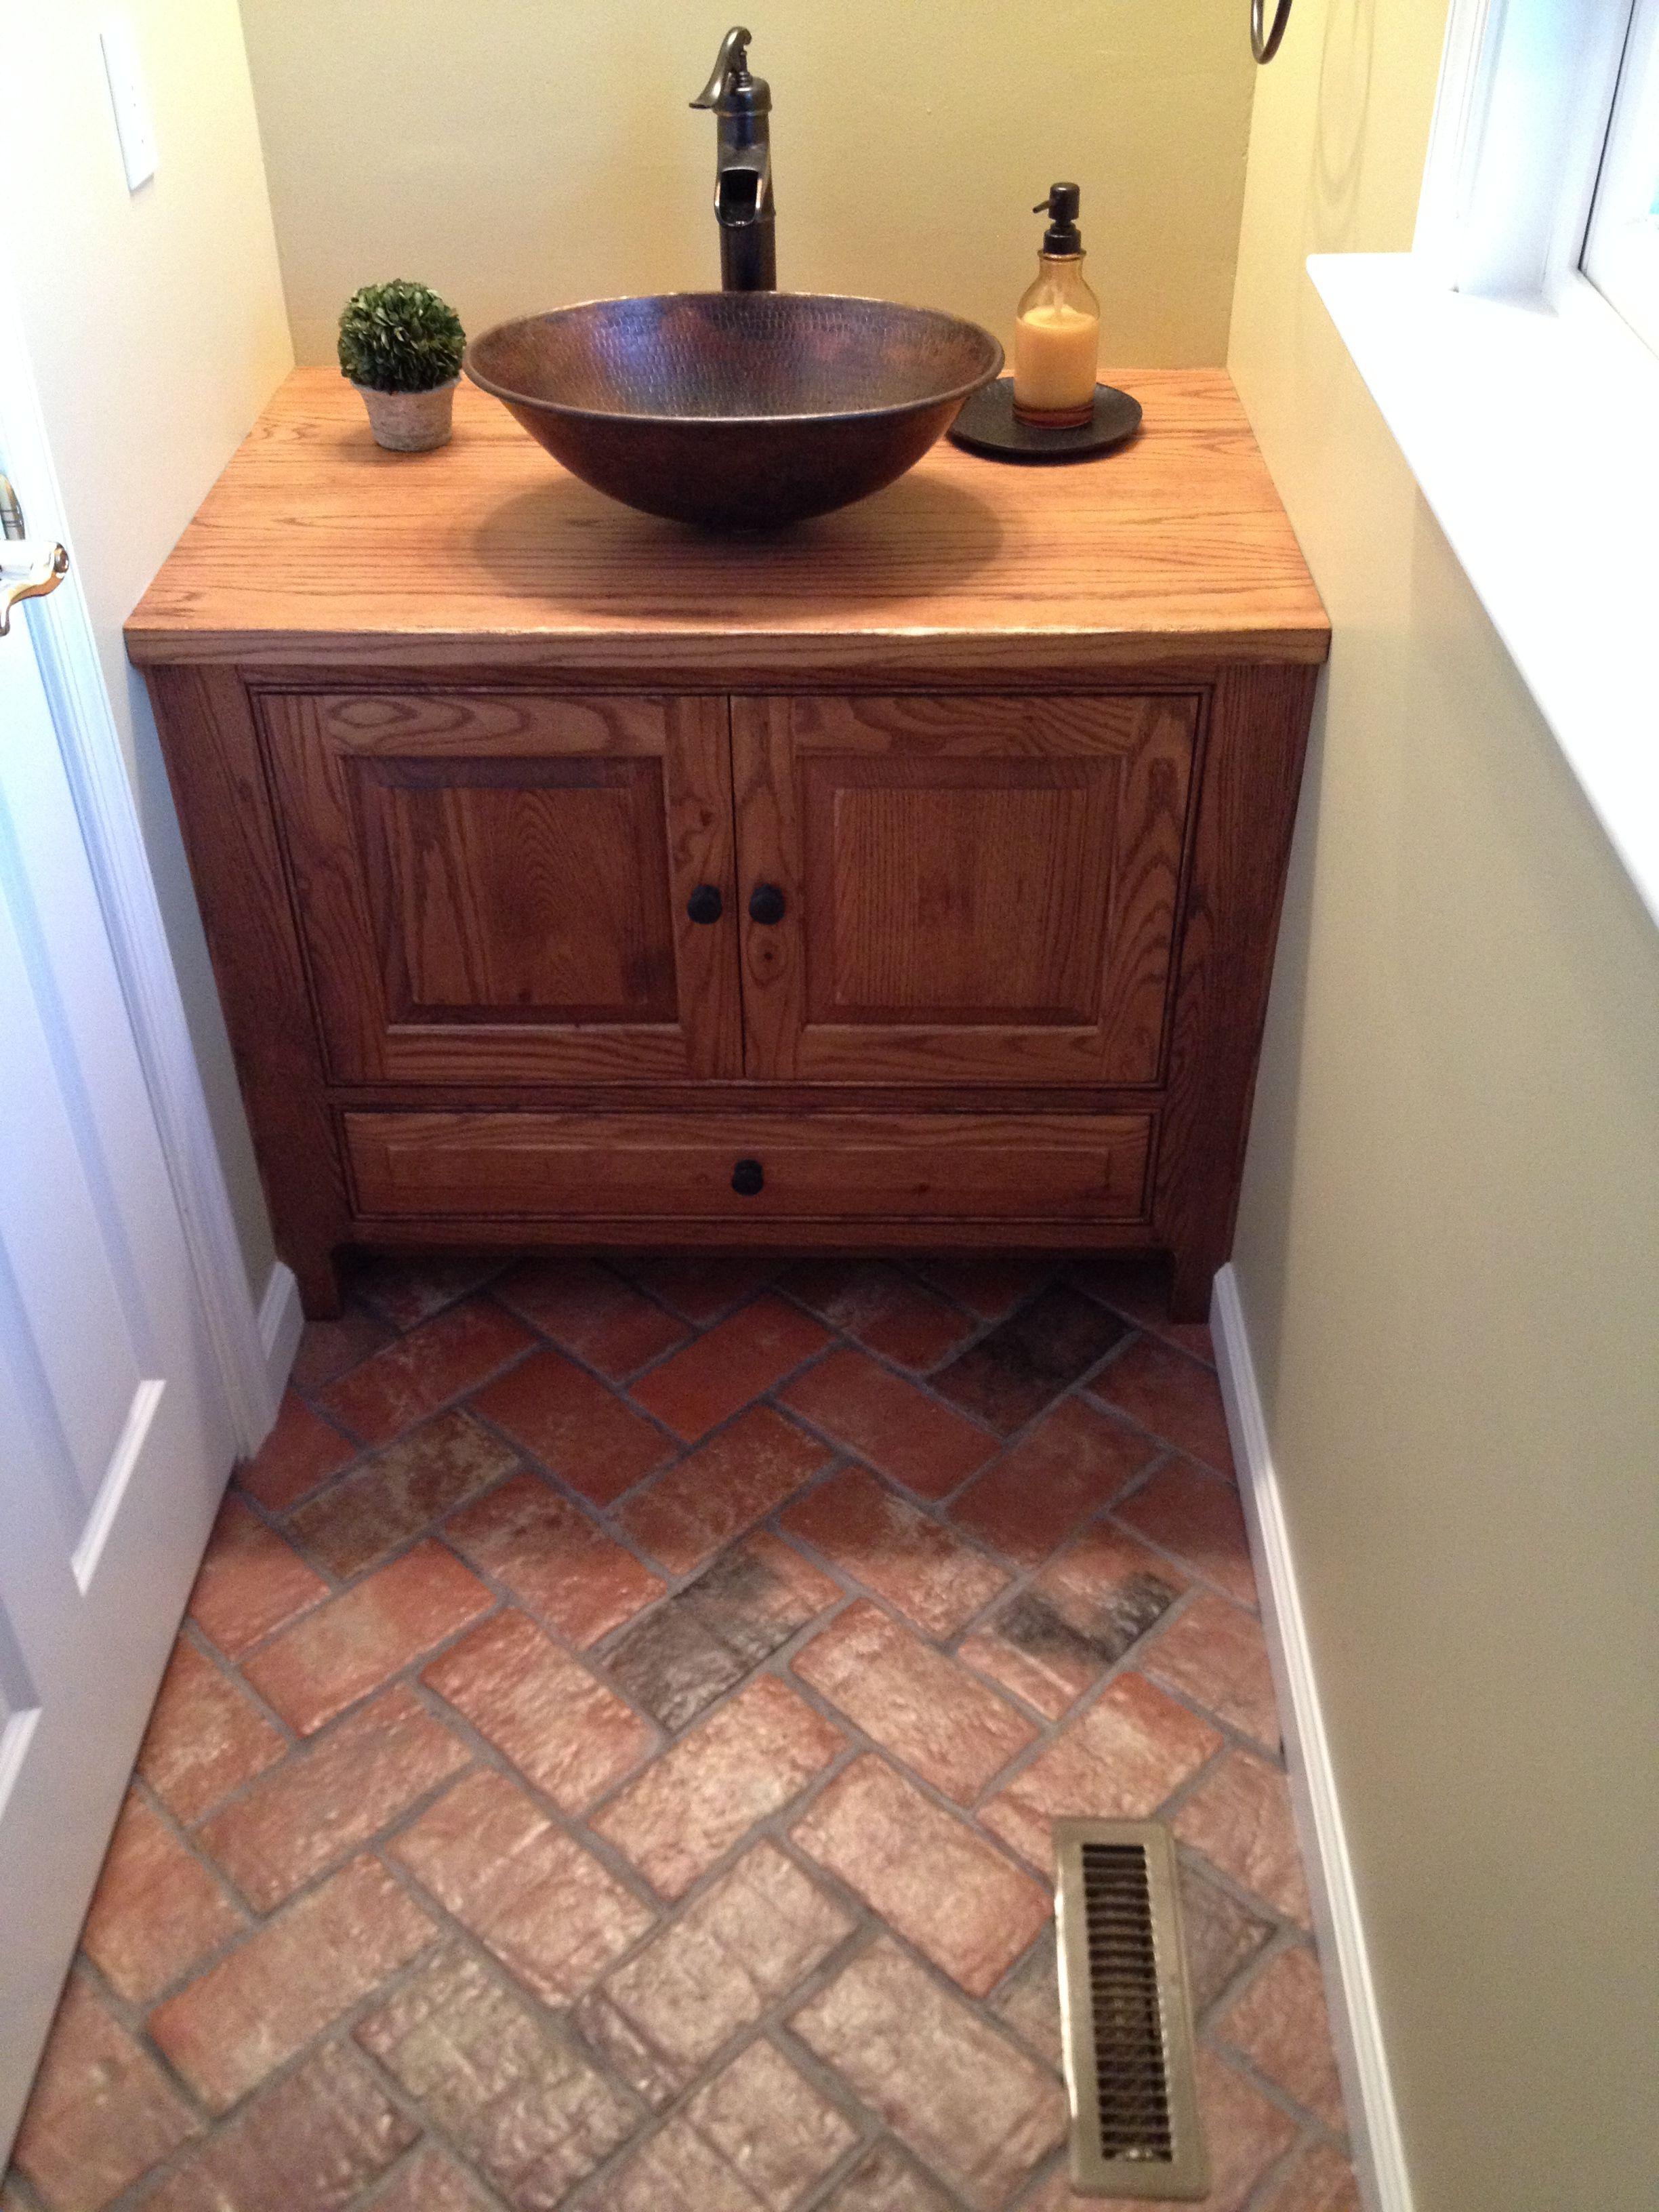 Wright S Ferry Brick Tile Powder Room Floor Marietta Color Mix With A Shiny Sealer Brick Tiles Bathroom Brick Bathroom Brick Tiles